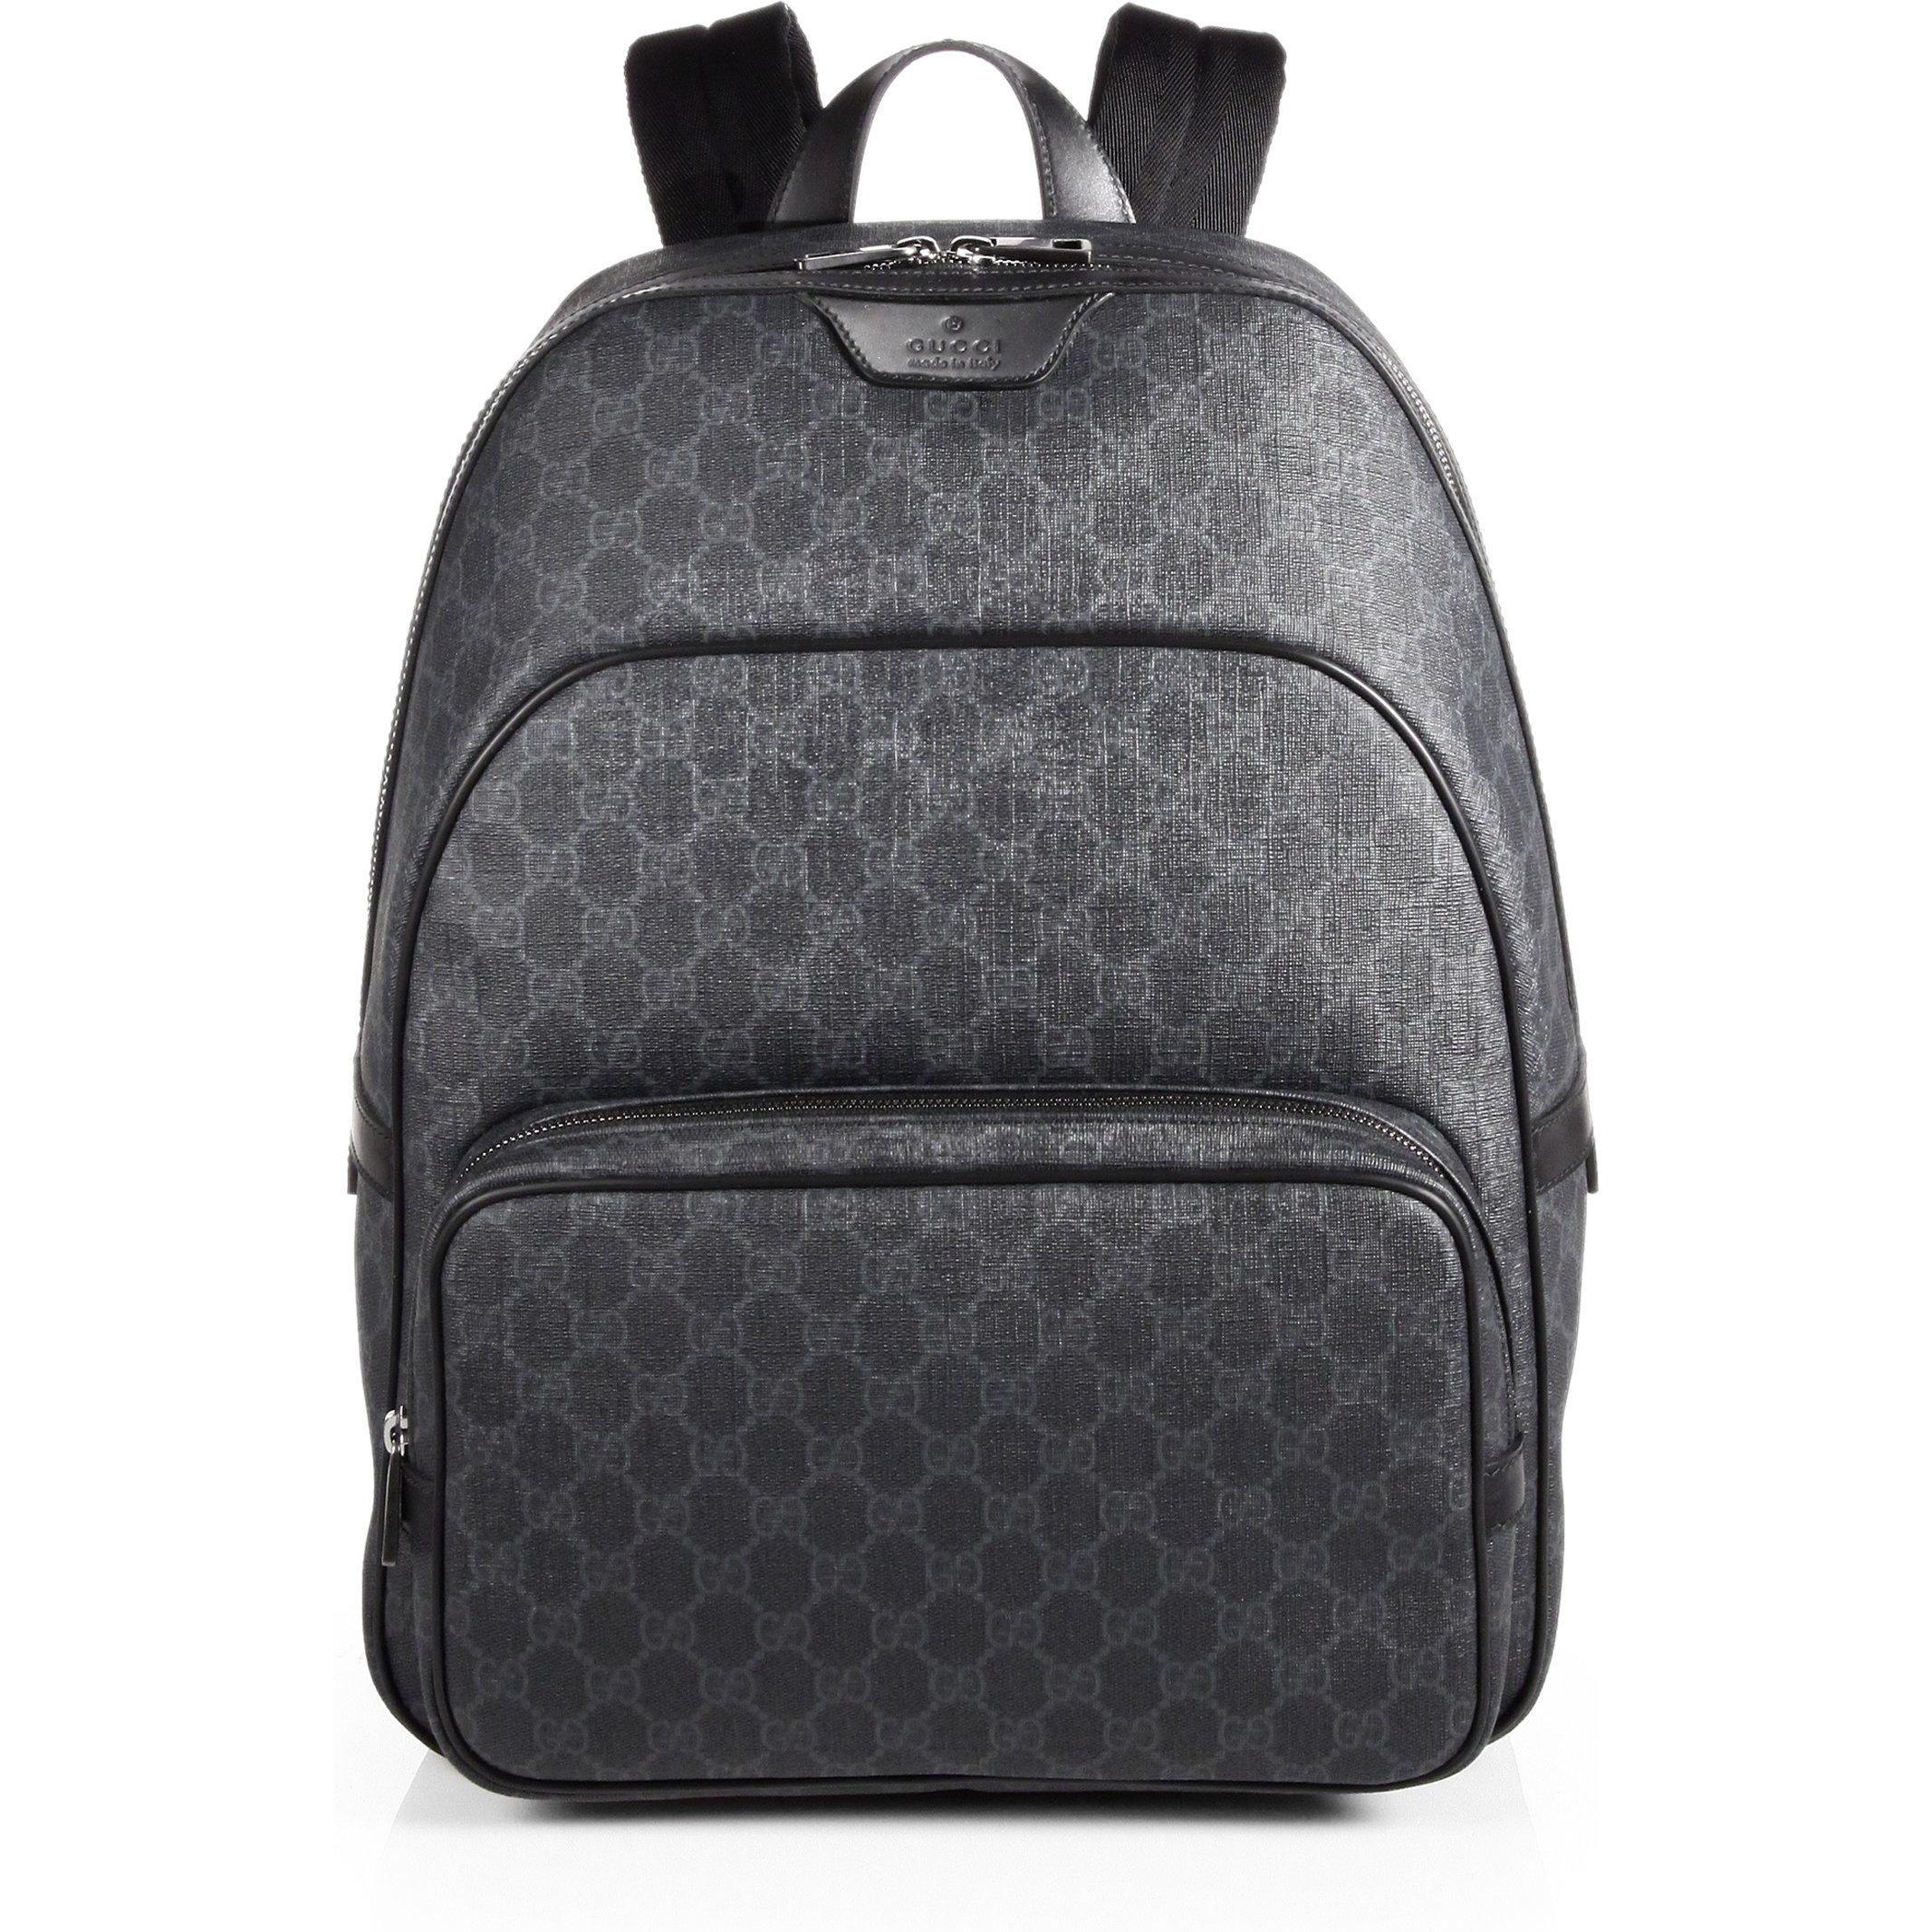 Gucci Gg Supreme Backpack as seen on Zayn Malik  8db79435bc03f